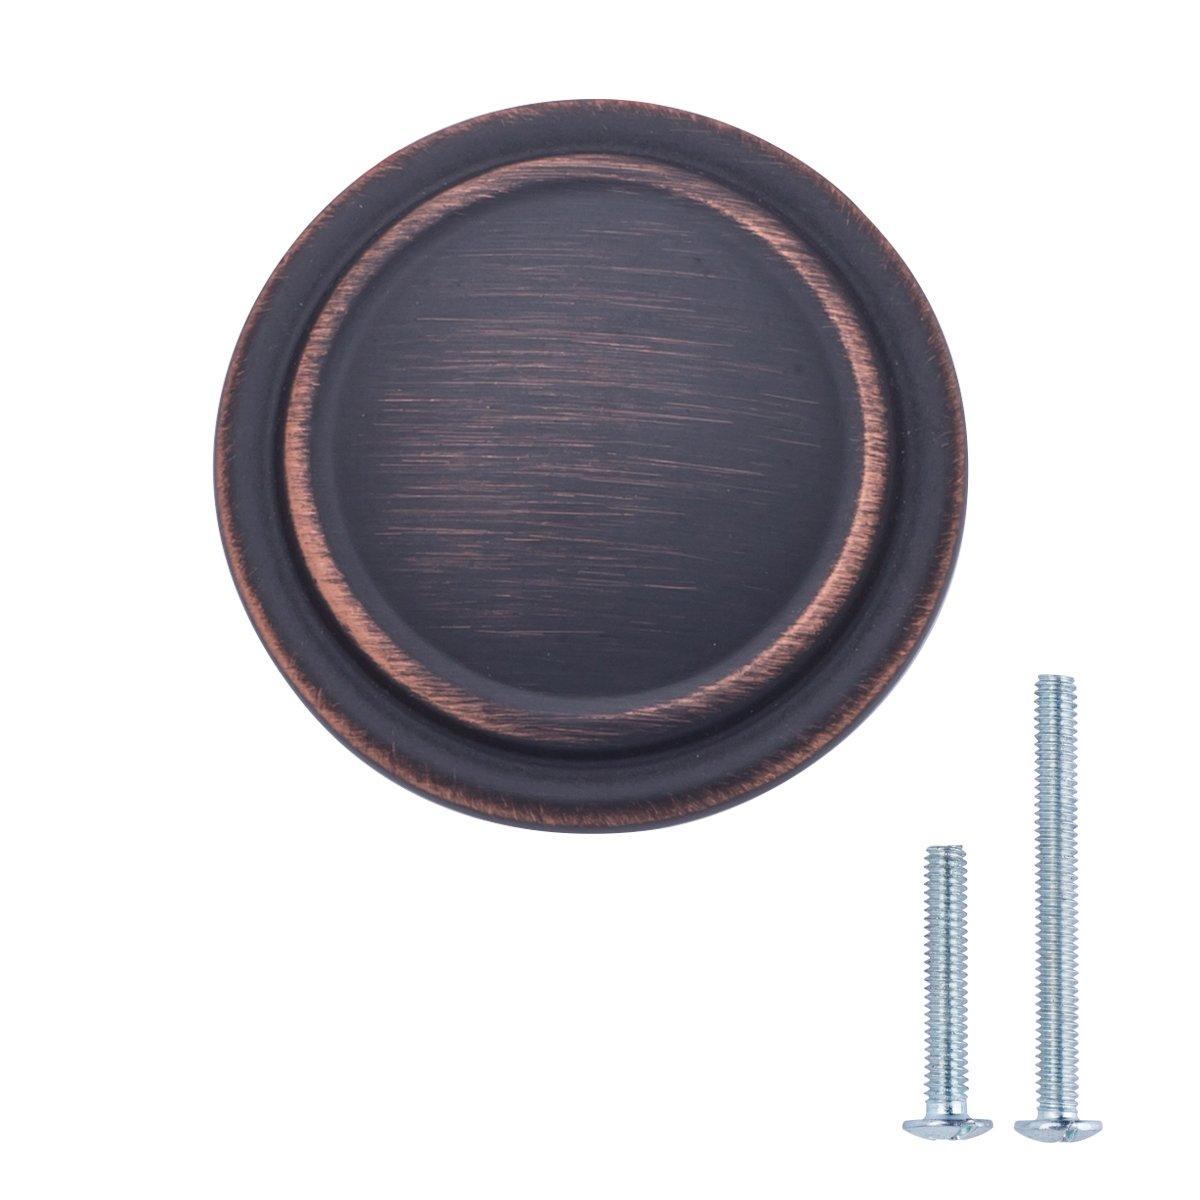 AmazonBasics Straight Top Ring Cabinet Knob, 1.25'' Diameter, Oil Rubbed Bronze, 10-Pack